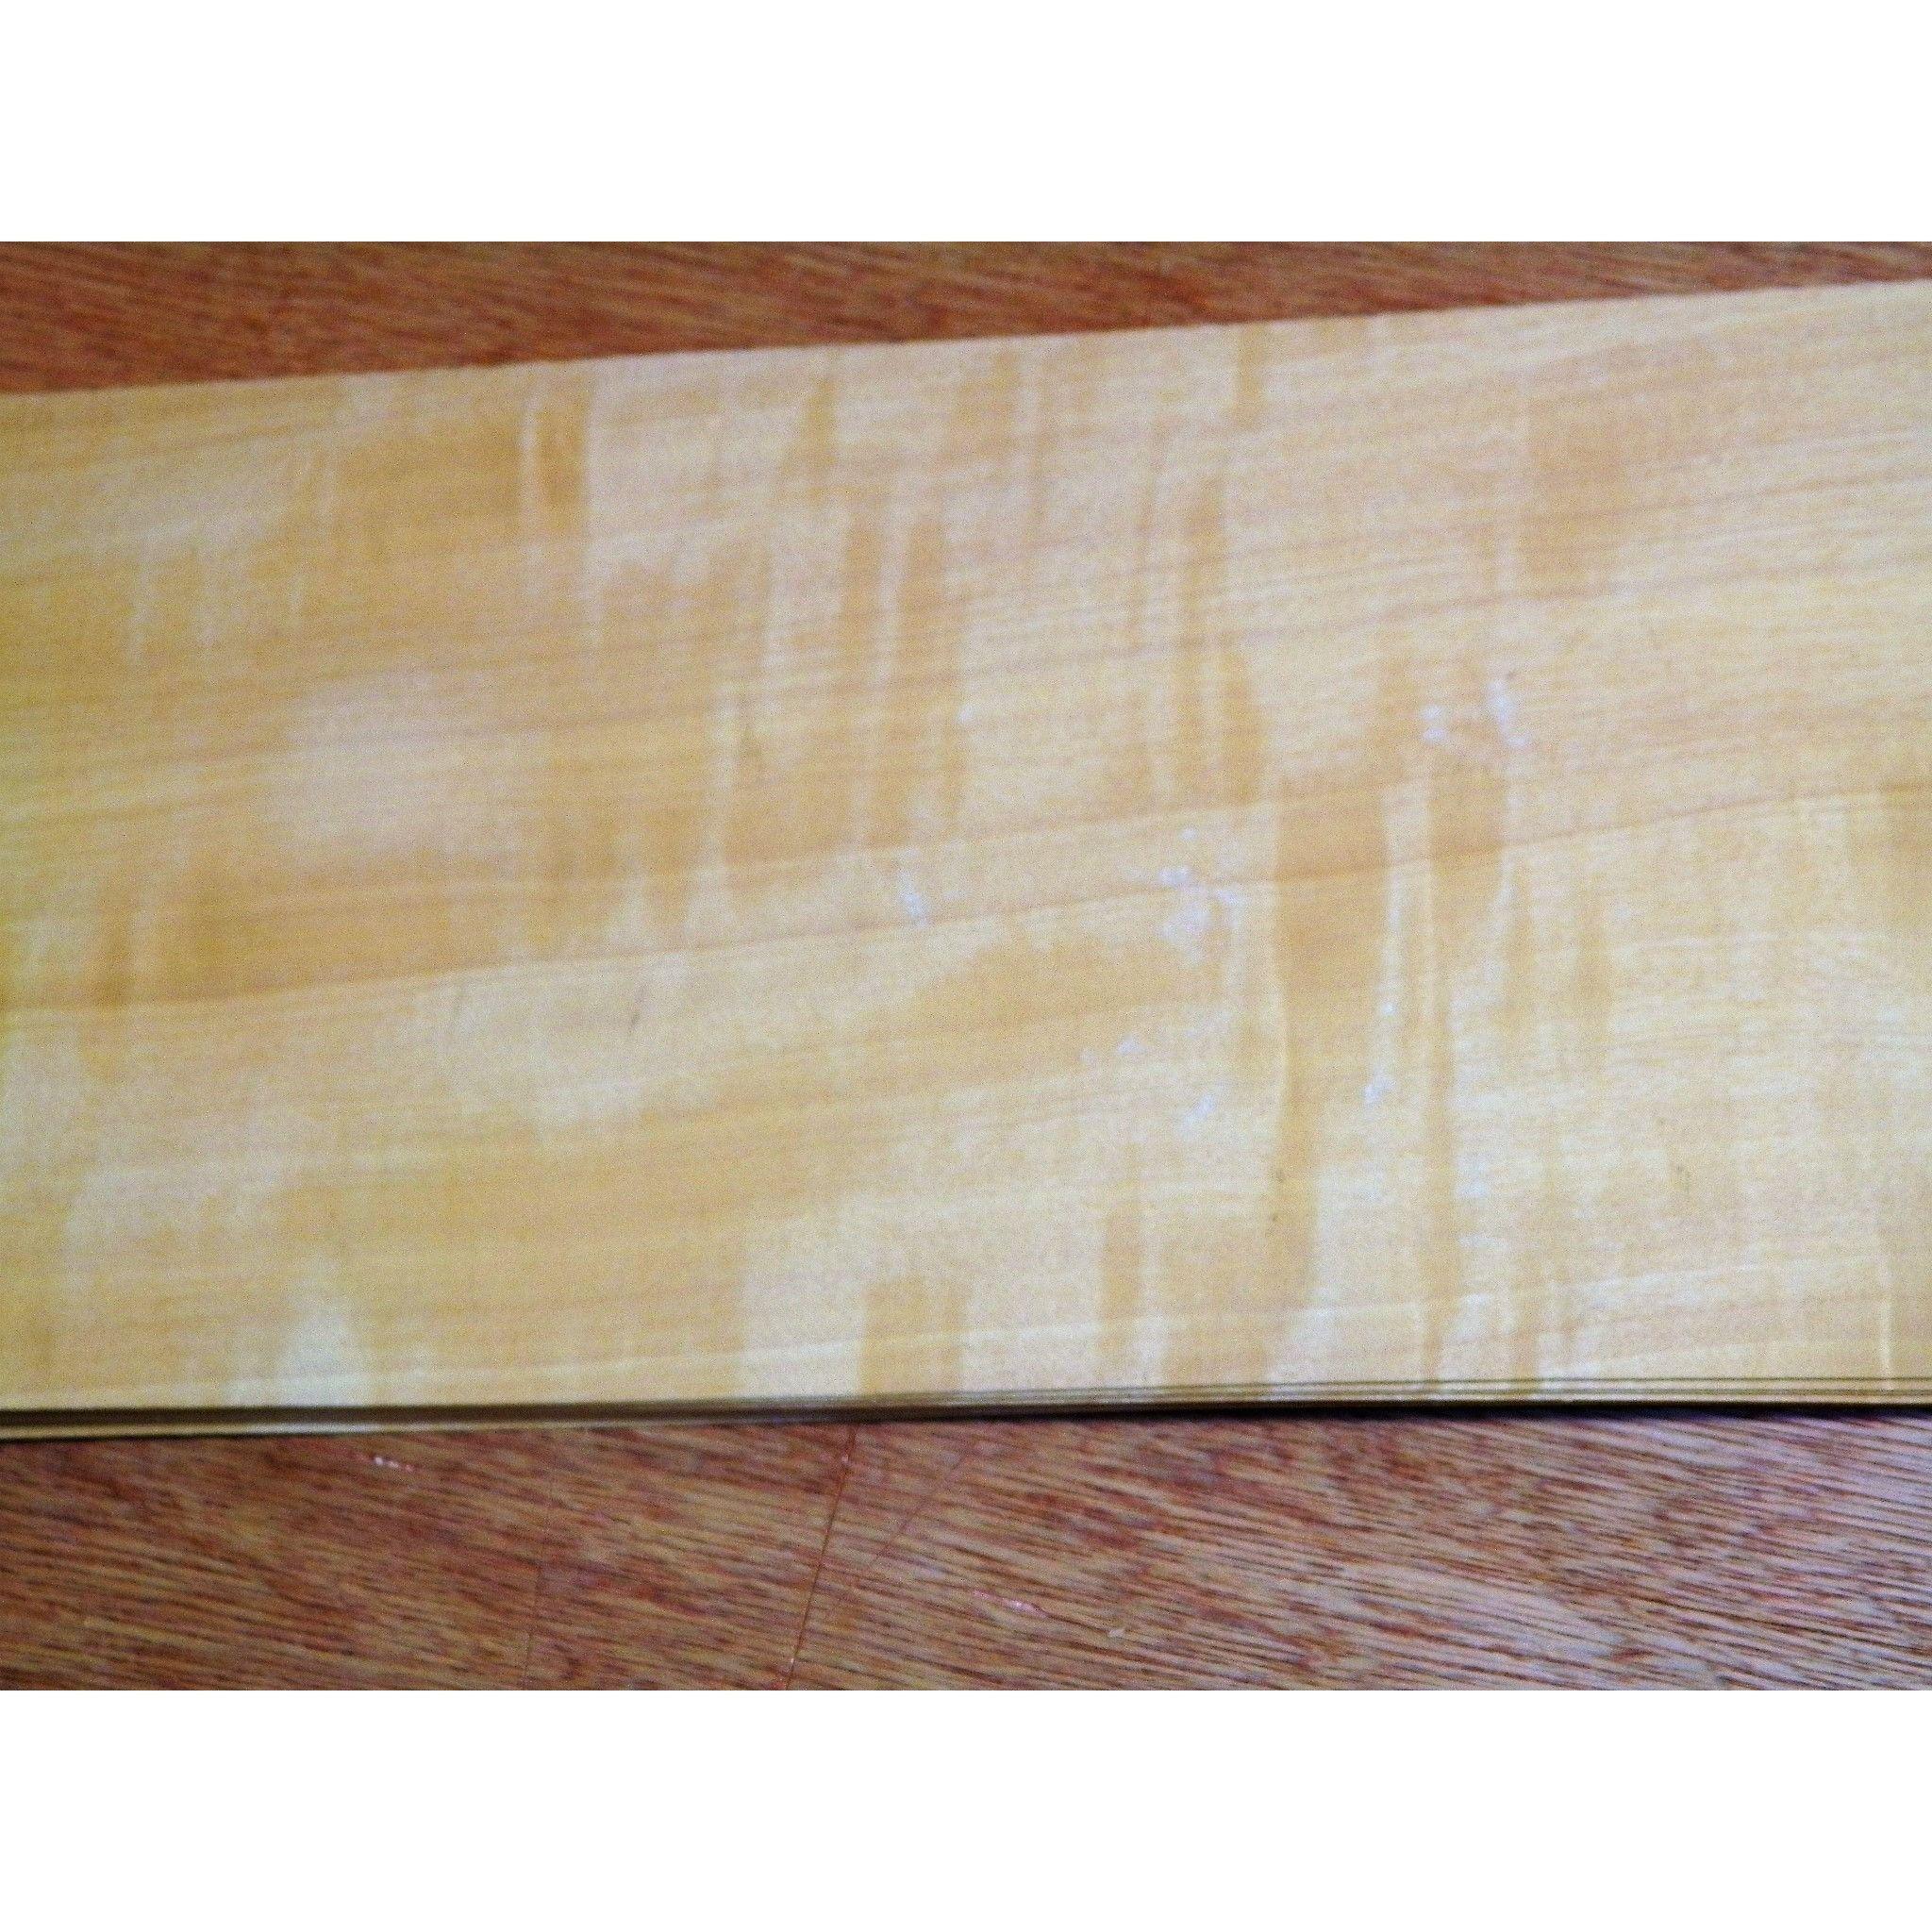 Anigre Raw Wood Veneer Block Mottled Figure 6 X 25 Inches 1 42nd Thick 7729 23 Wood Veneer Sheets Raw Wood Wood Veneer